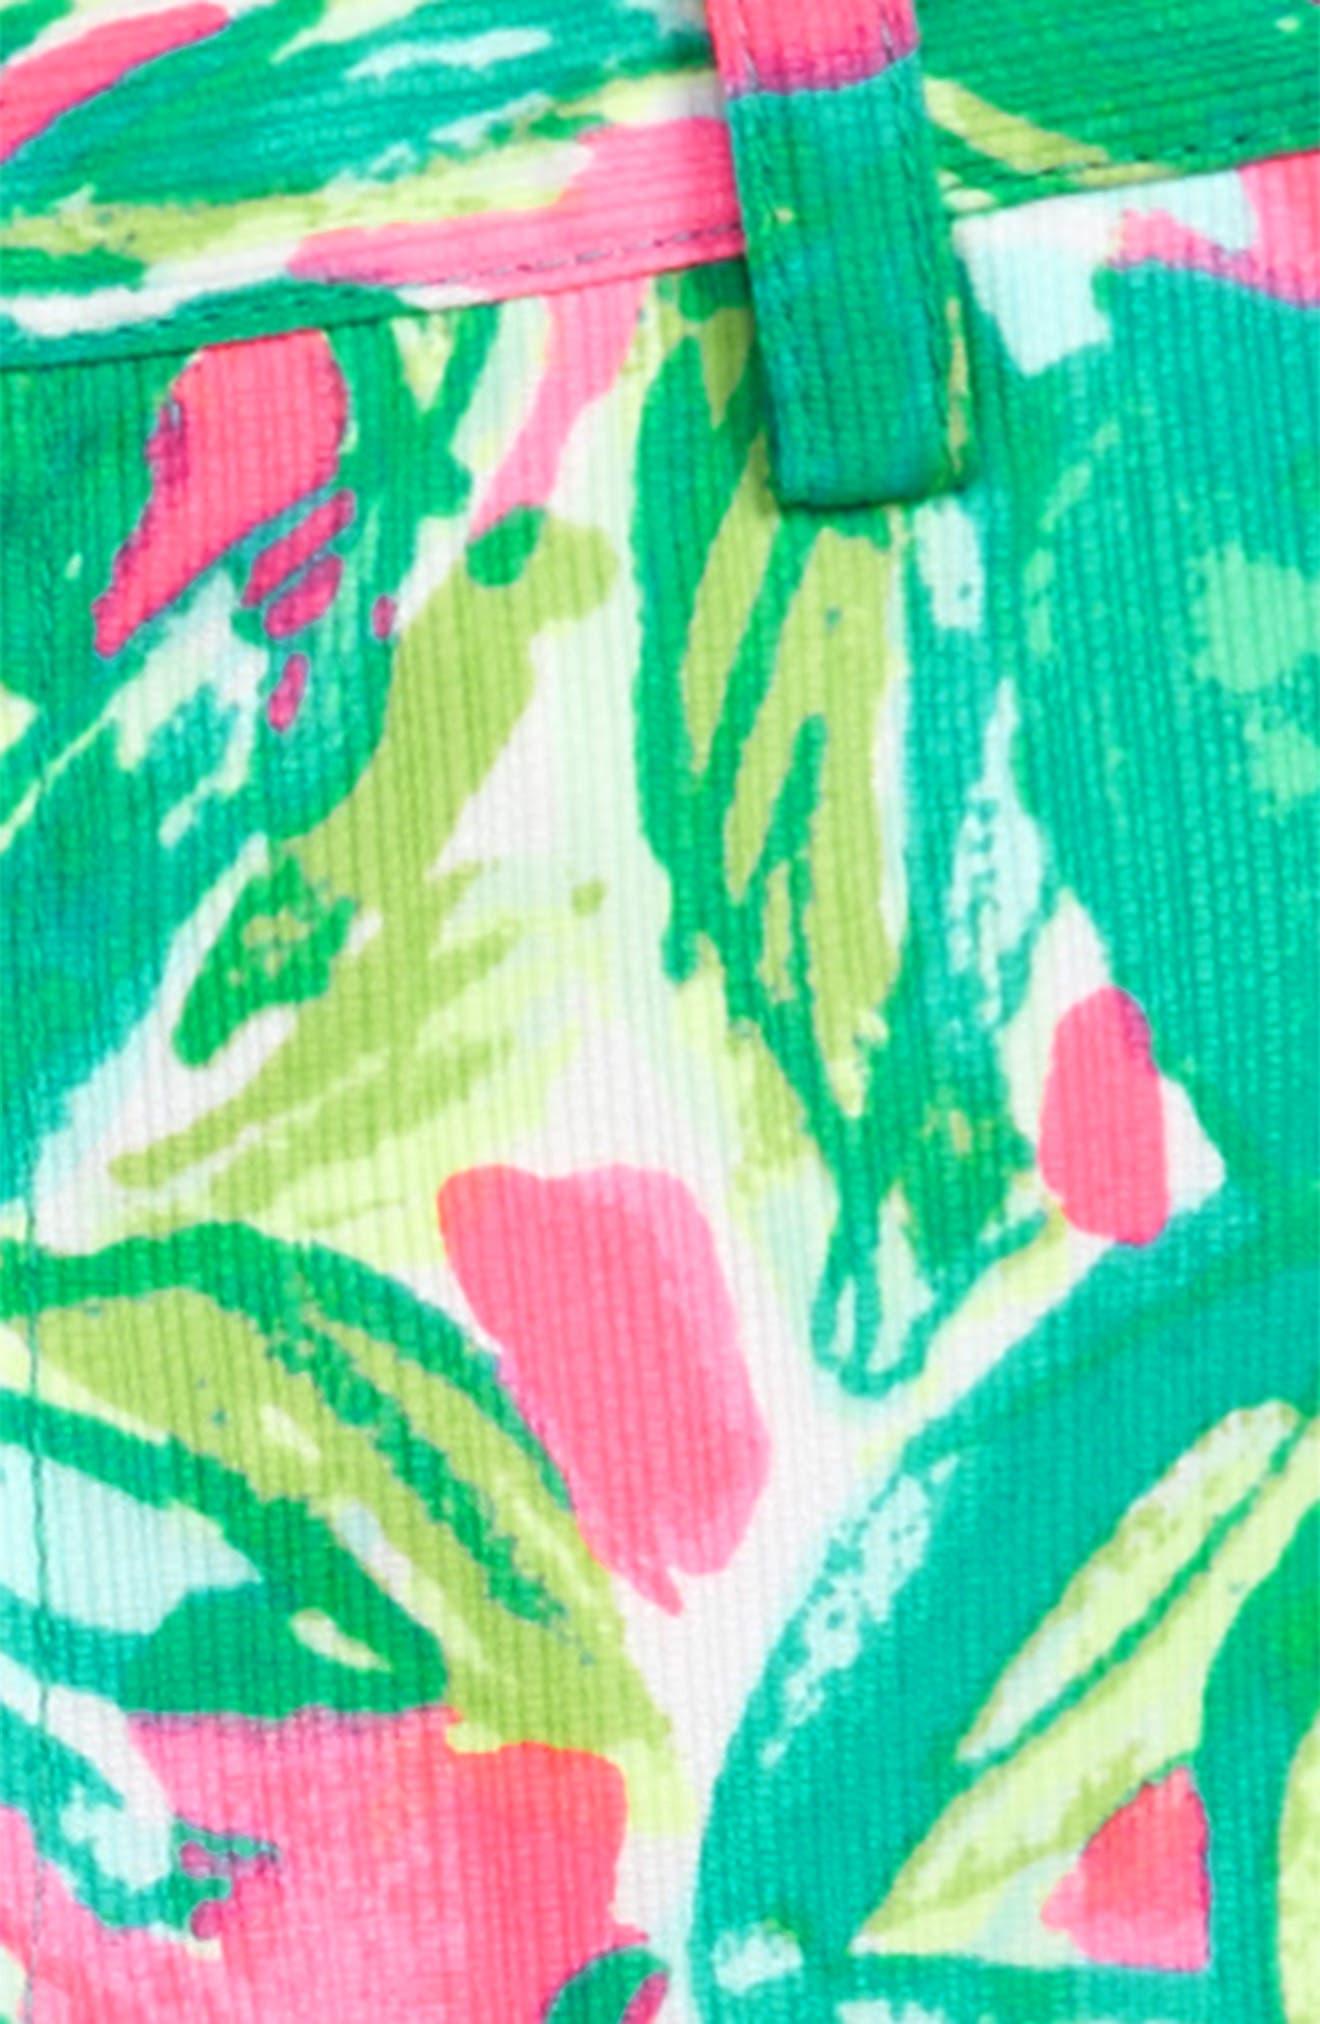 Lily Pulitzer Beaumont Print Shorts,                             Alternate thumbnail 2, color,                             697